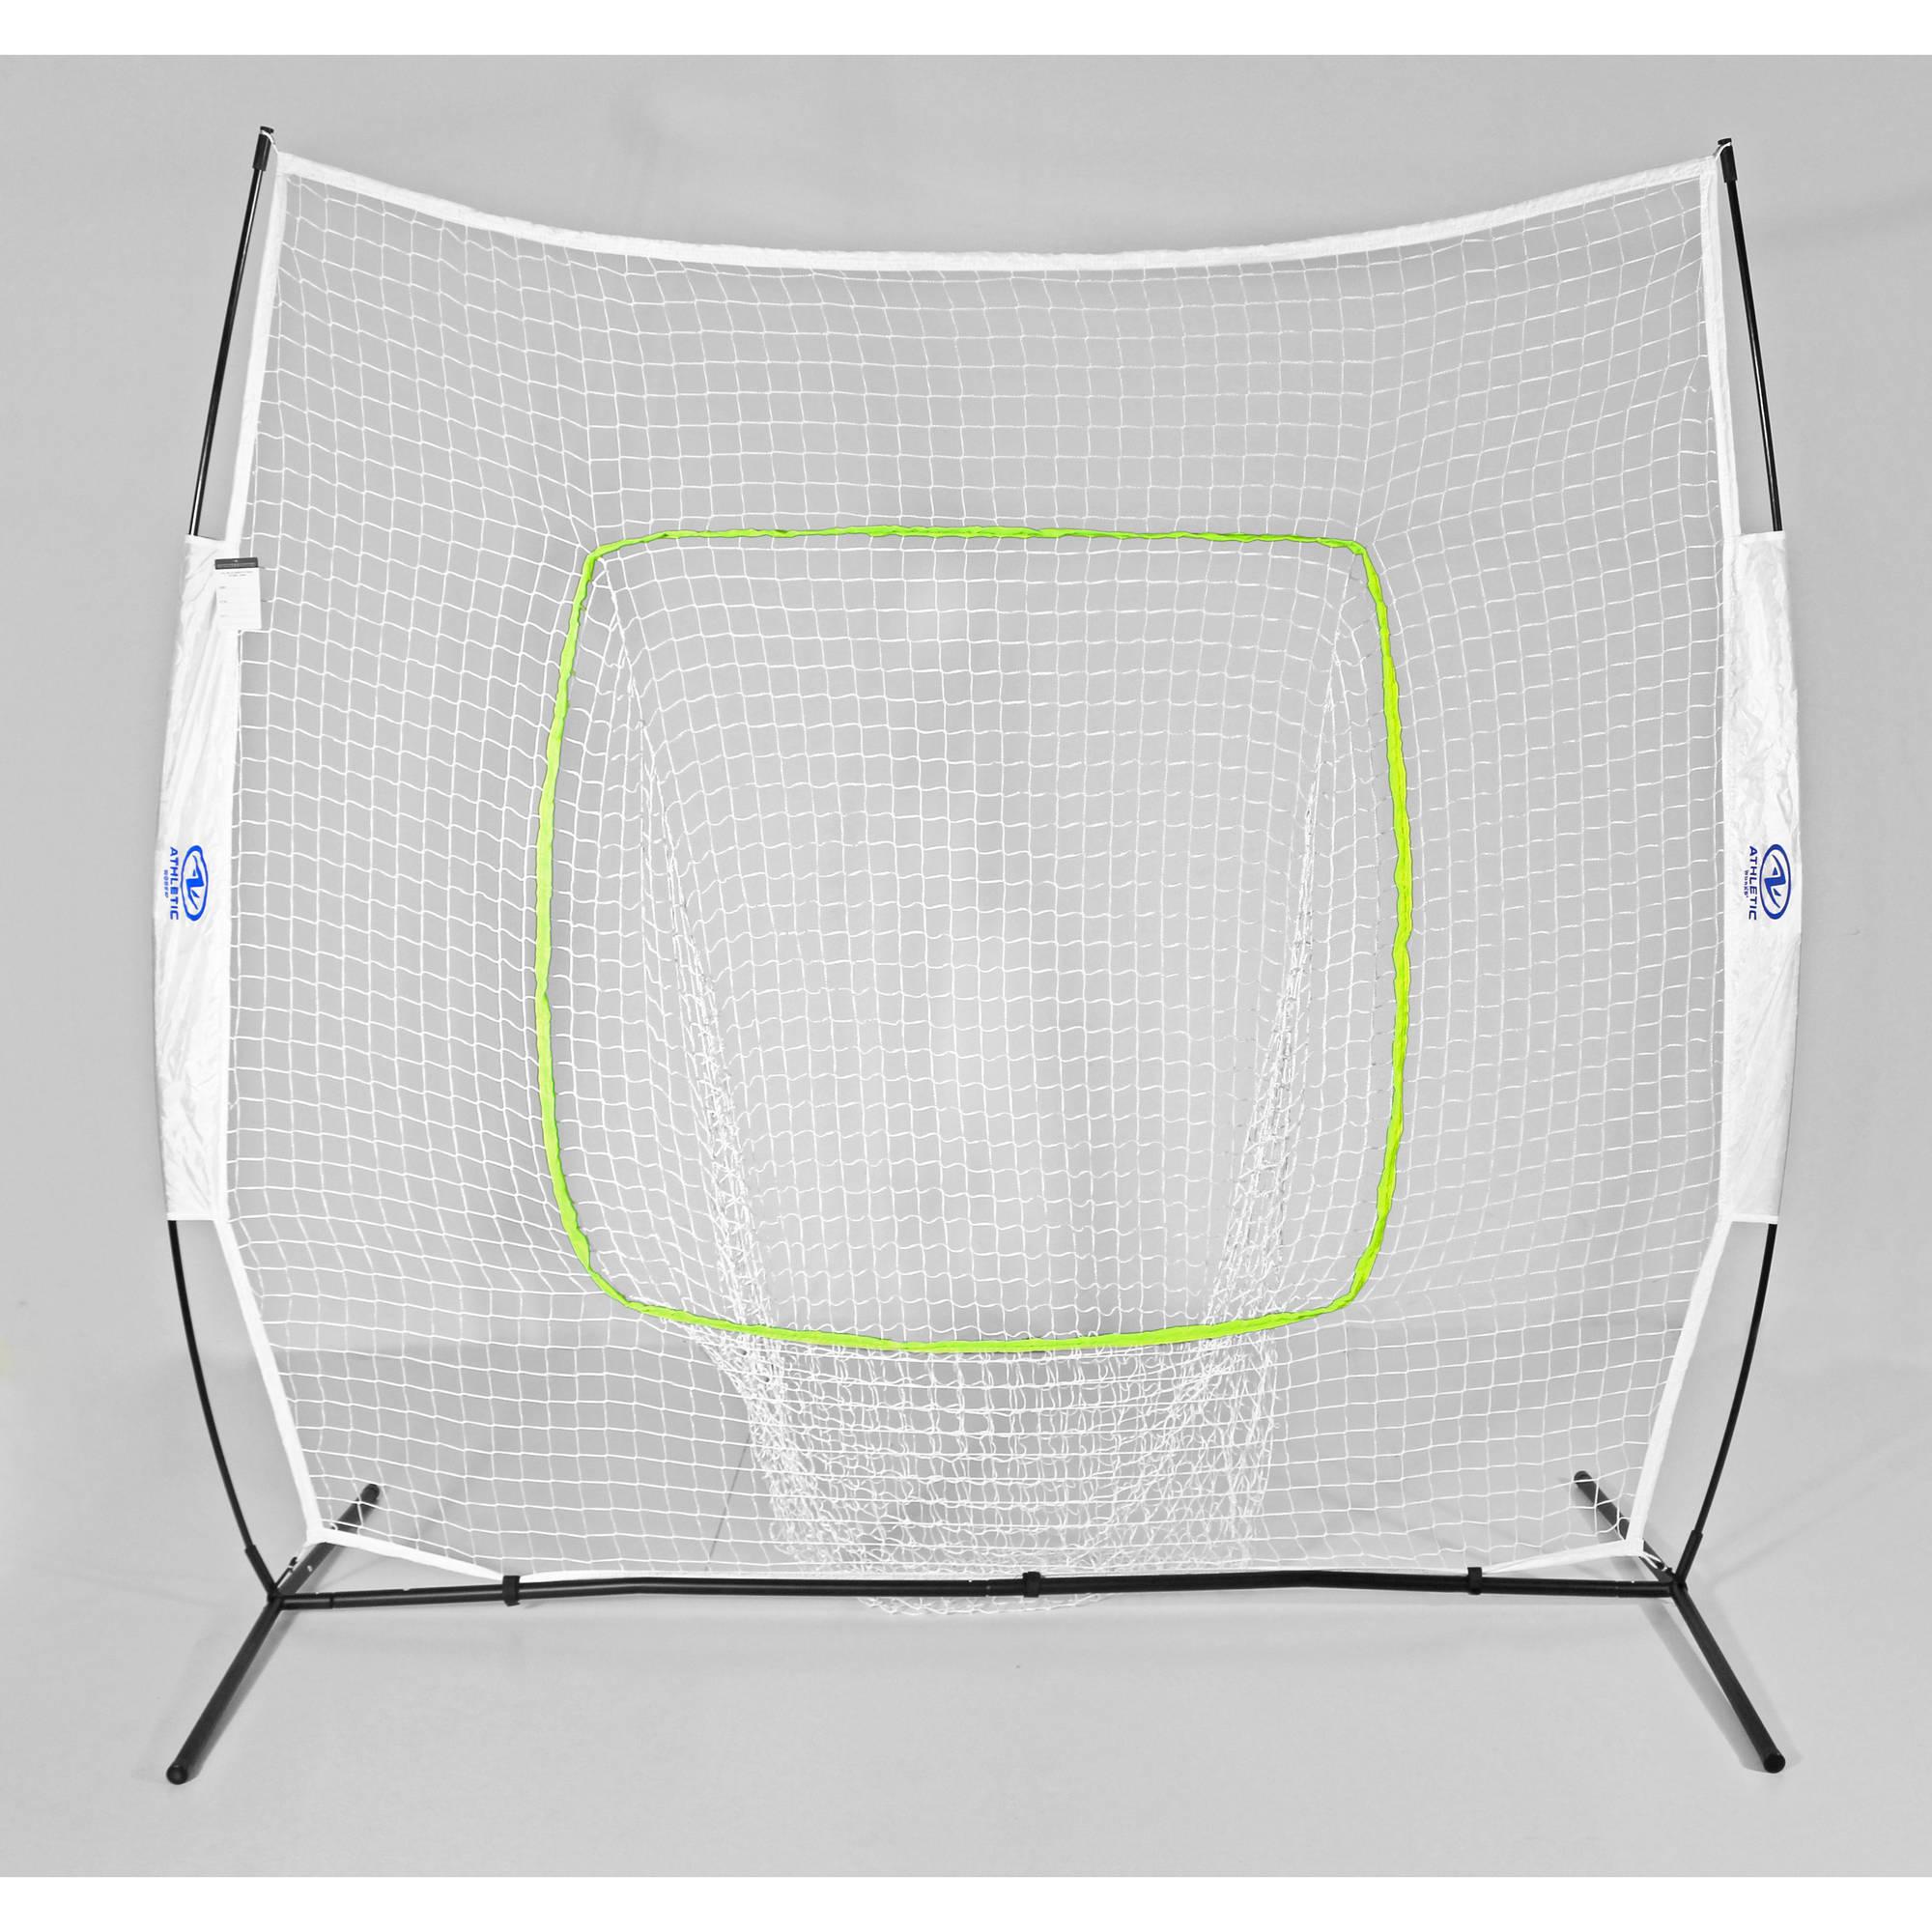 Athletic Works 7' x 7' Baseball & Softball Instant Training Net